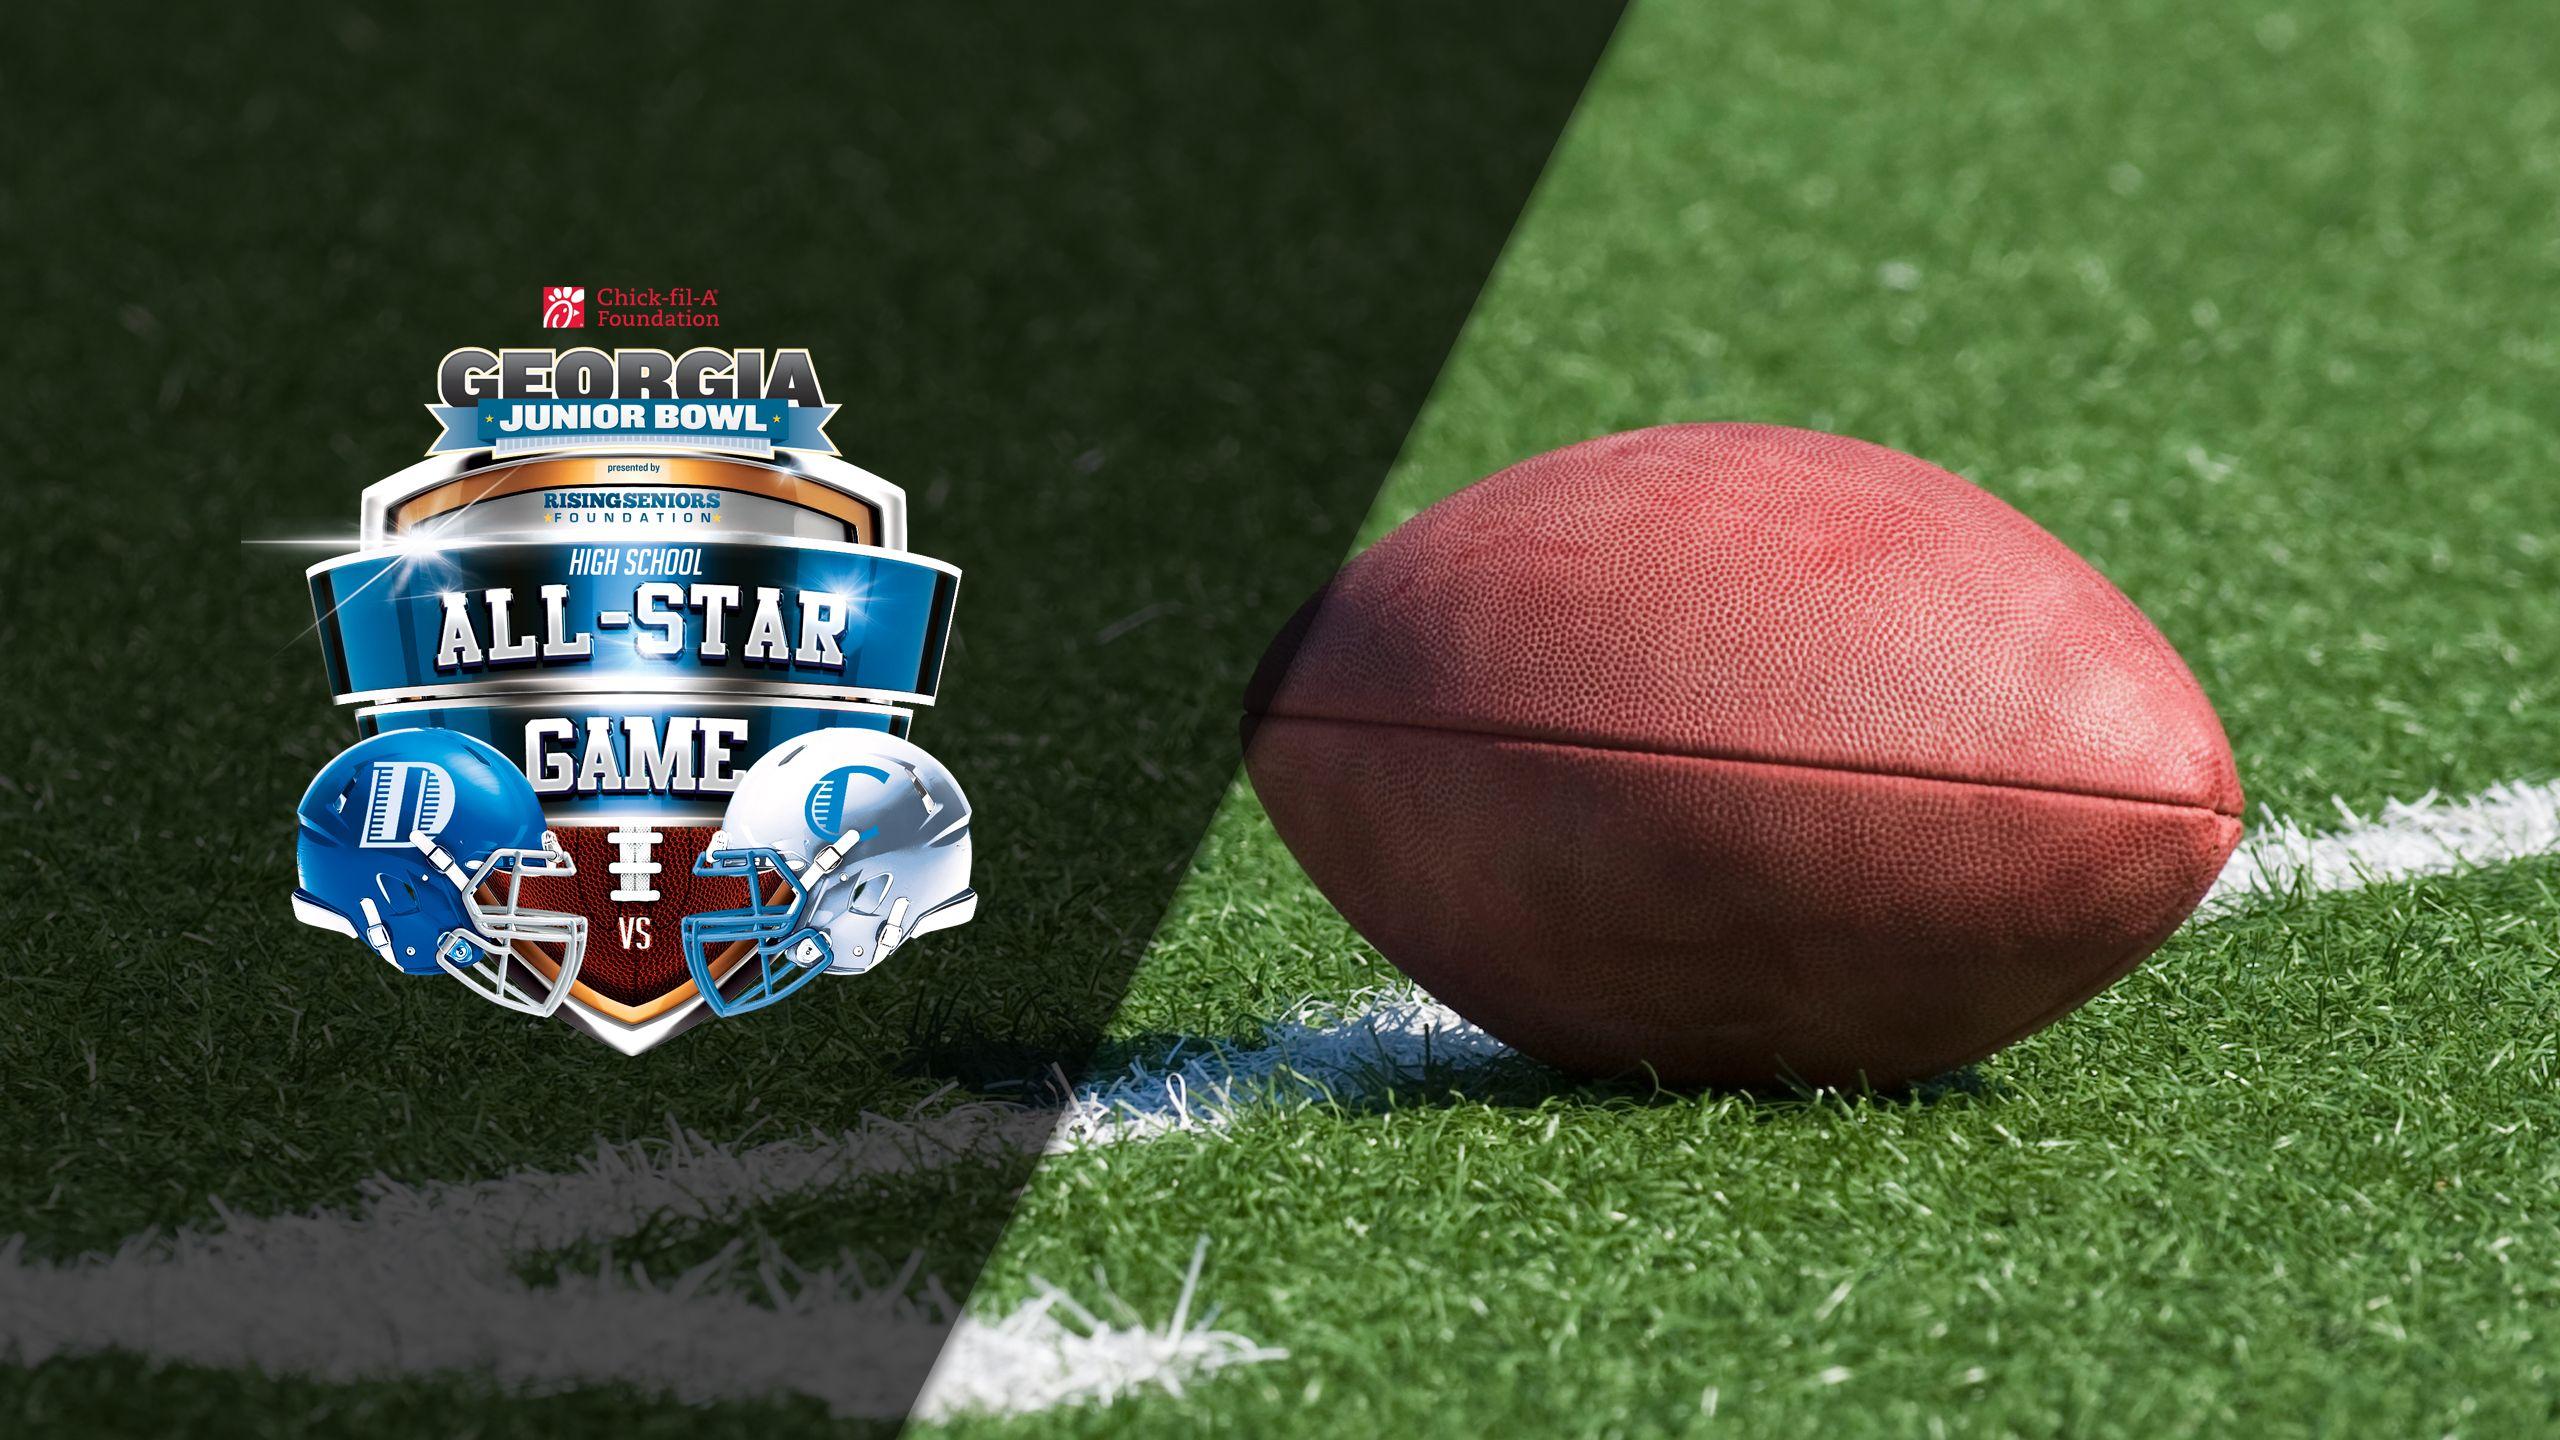 Team Dedication vs. Team Commitment (Chick-fil-A Foundation Georgia Junior Bowl)